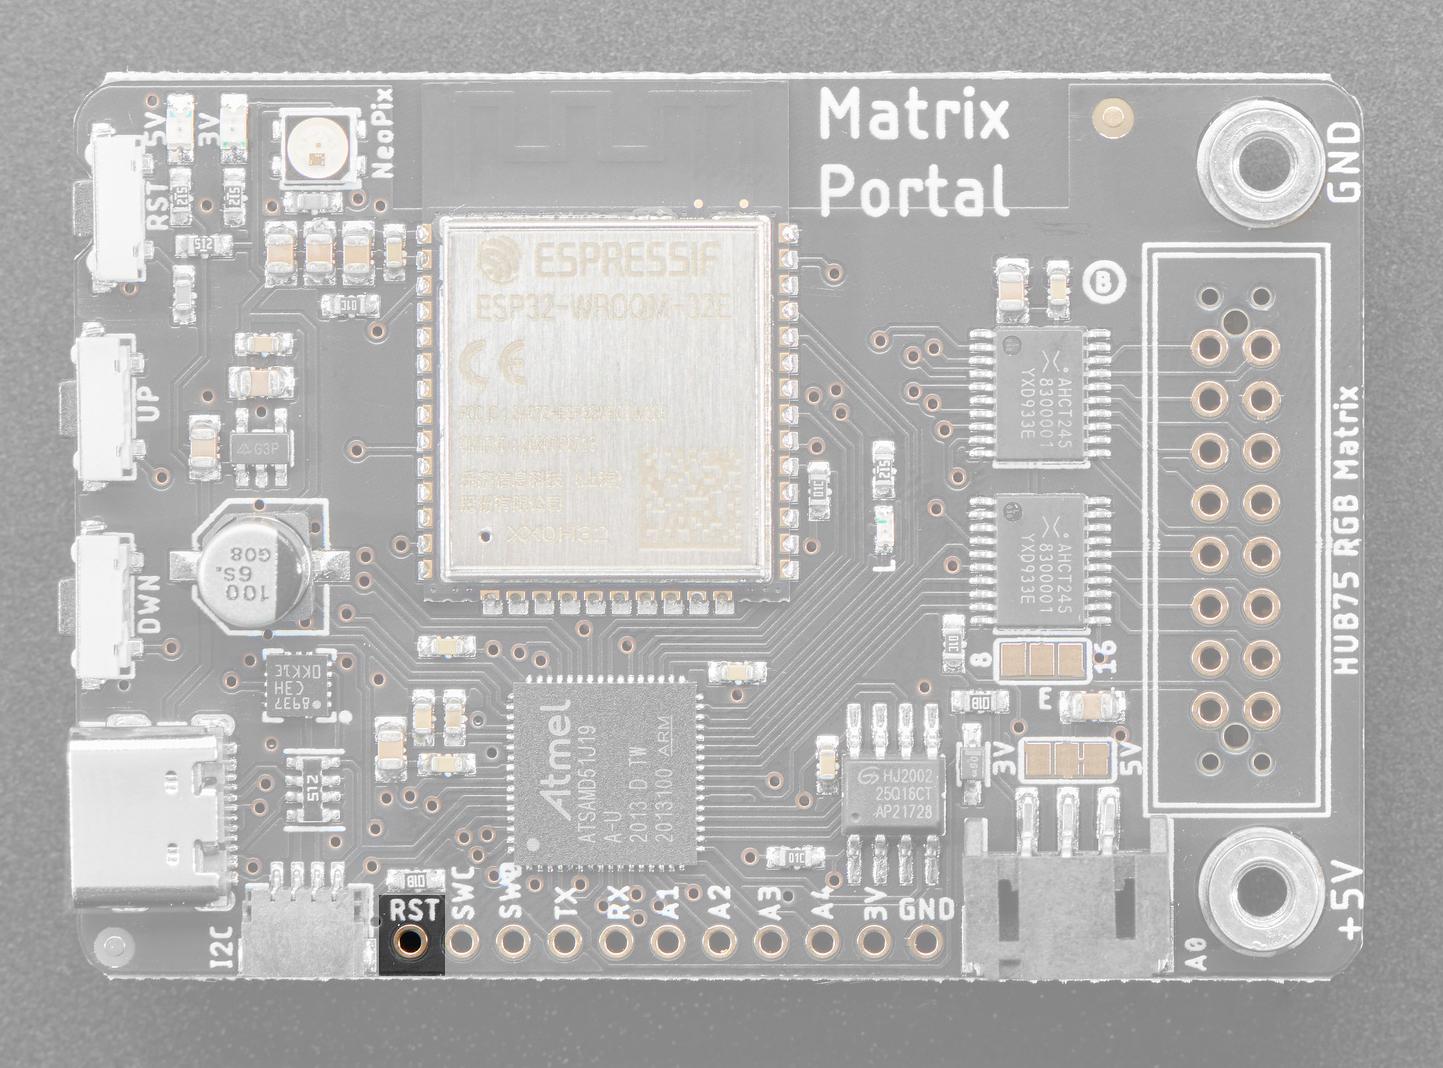 led_matrices_matrixportal_pinout_reset.jpg